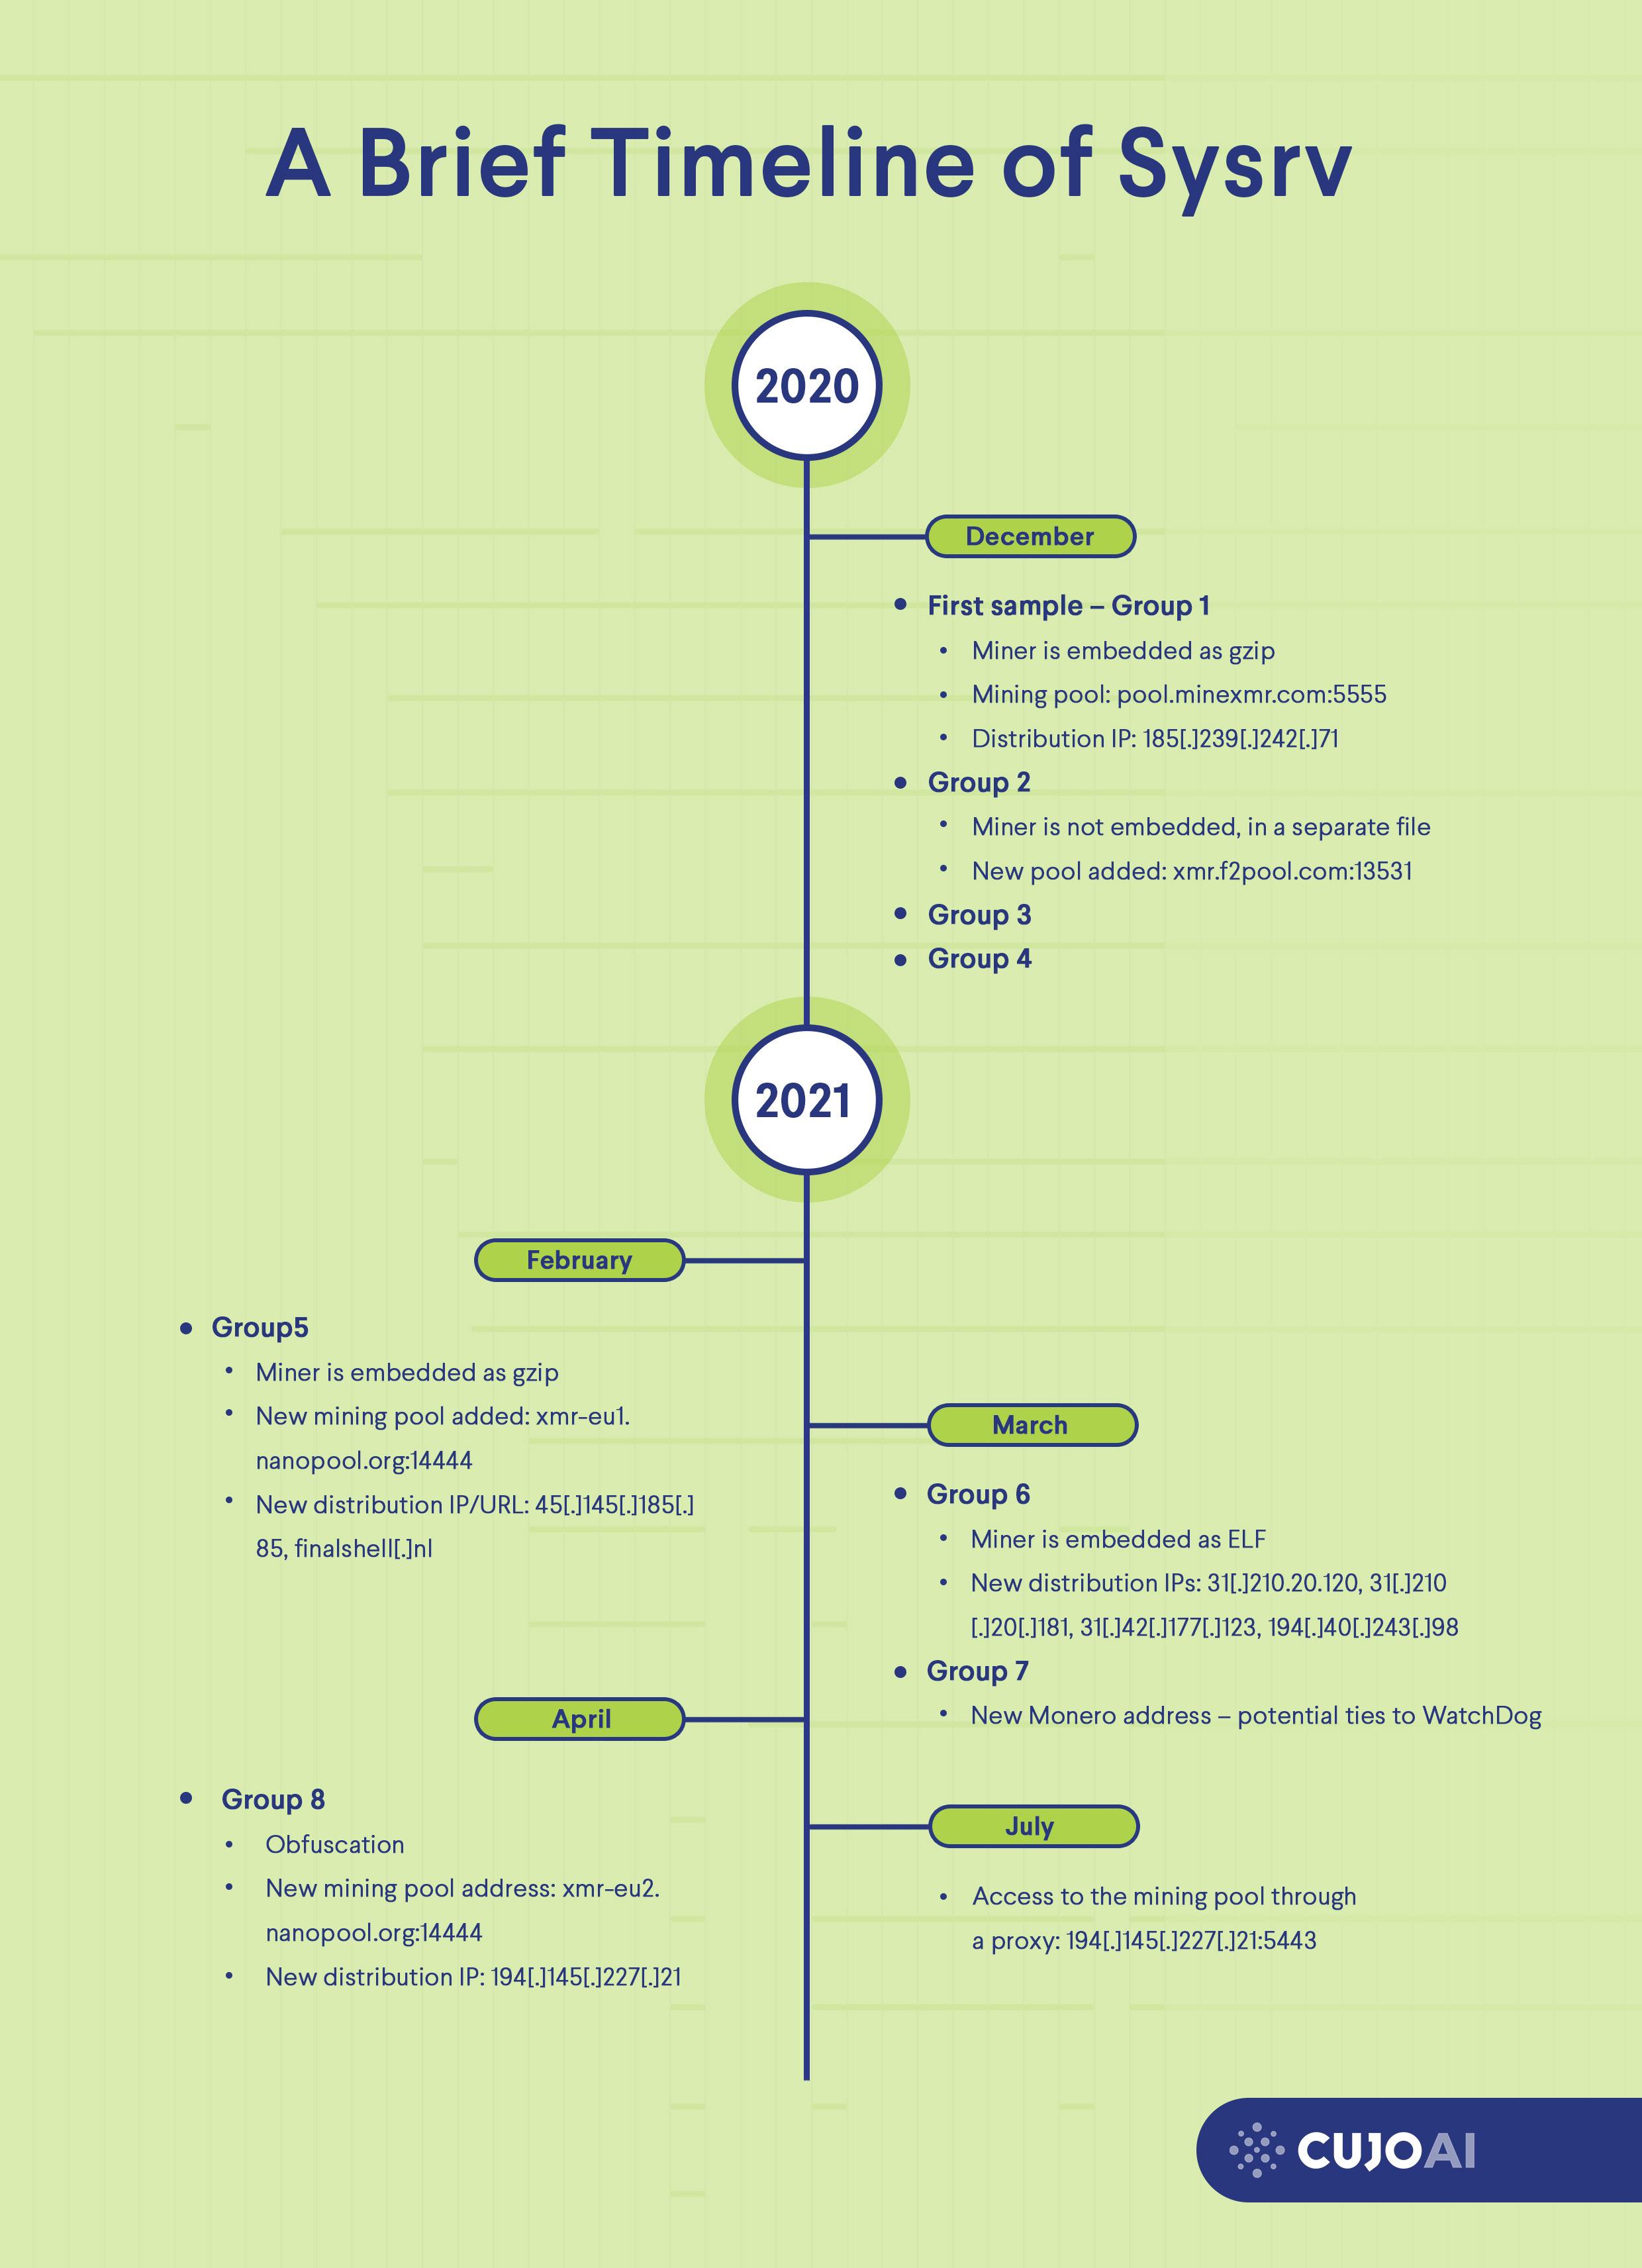 Sysrv botnet timeline brief